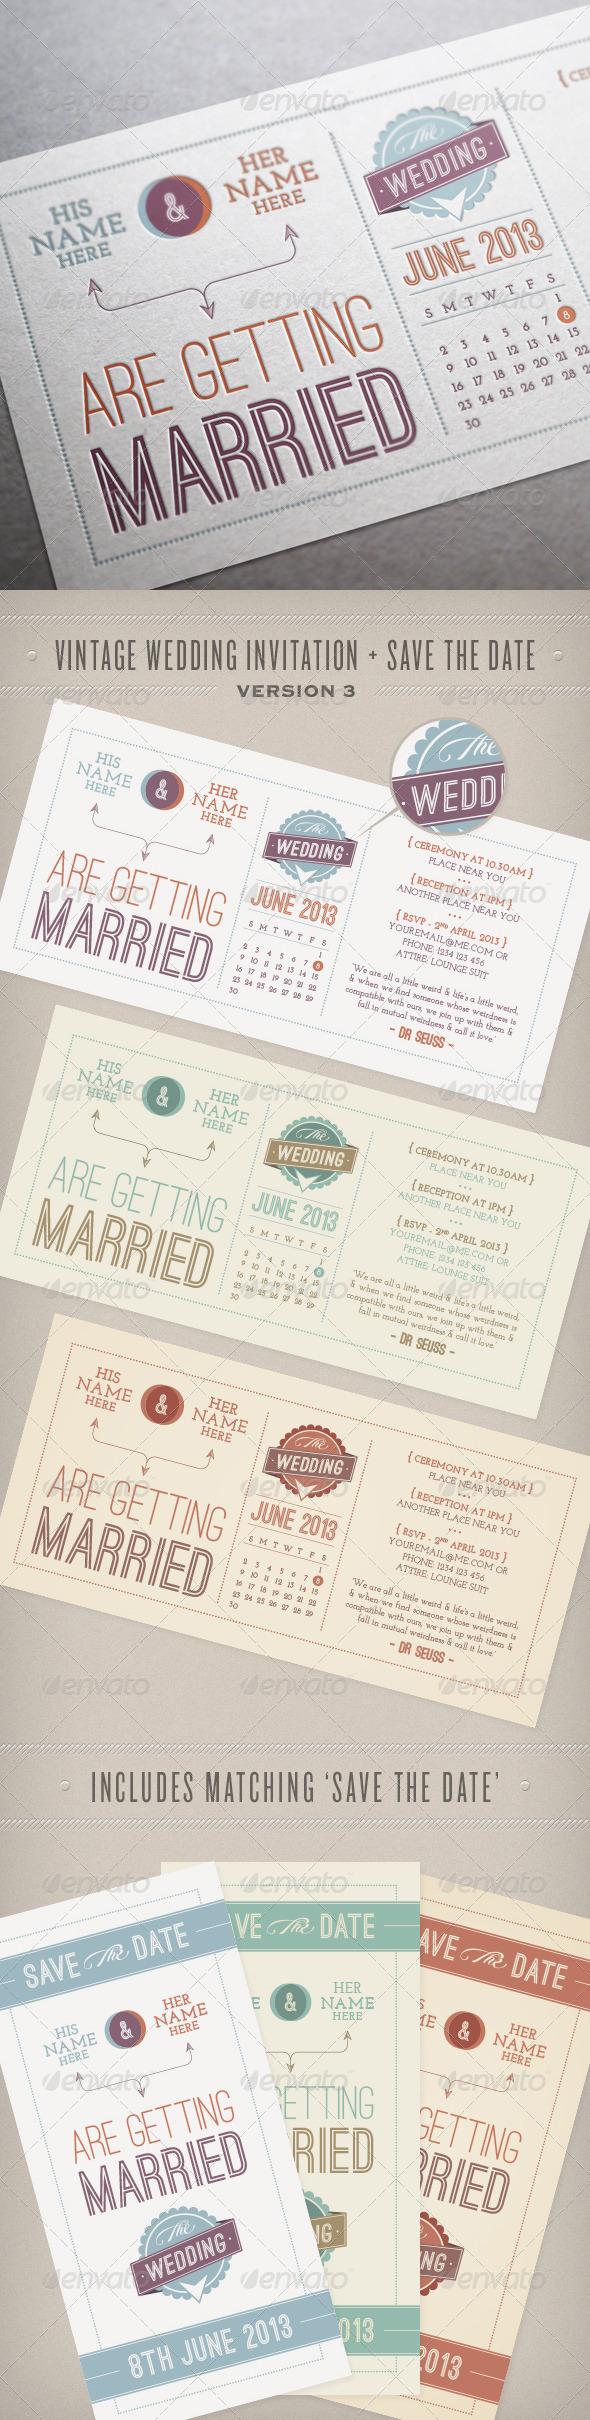 Vintage Wedding Invitation & Save the Date